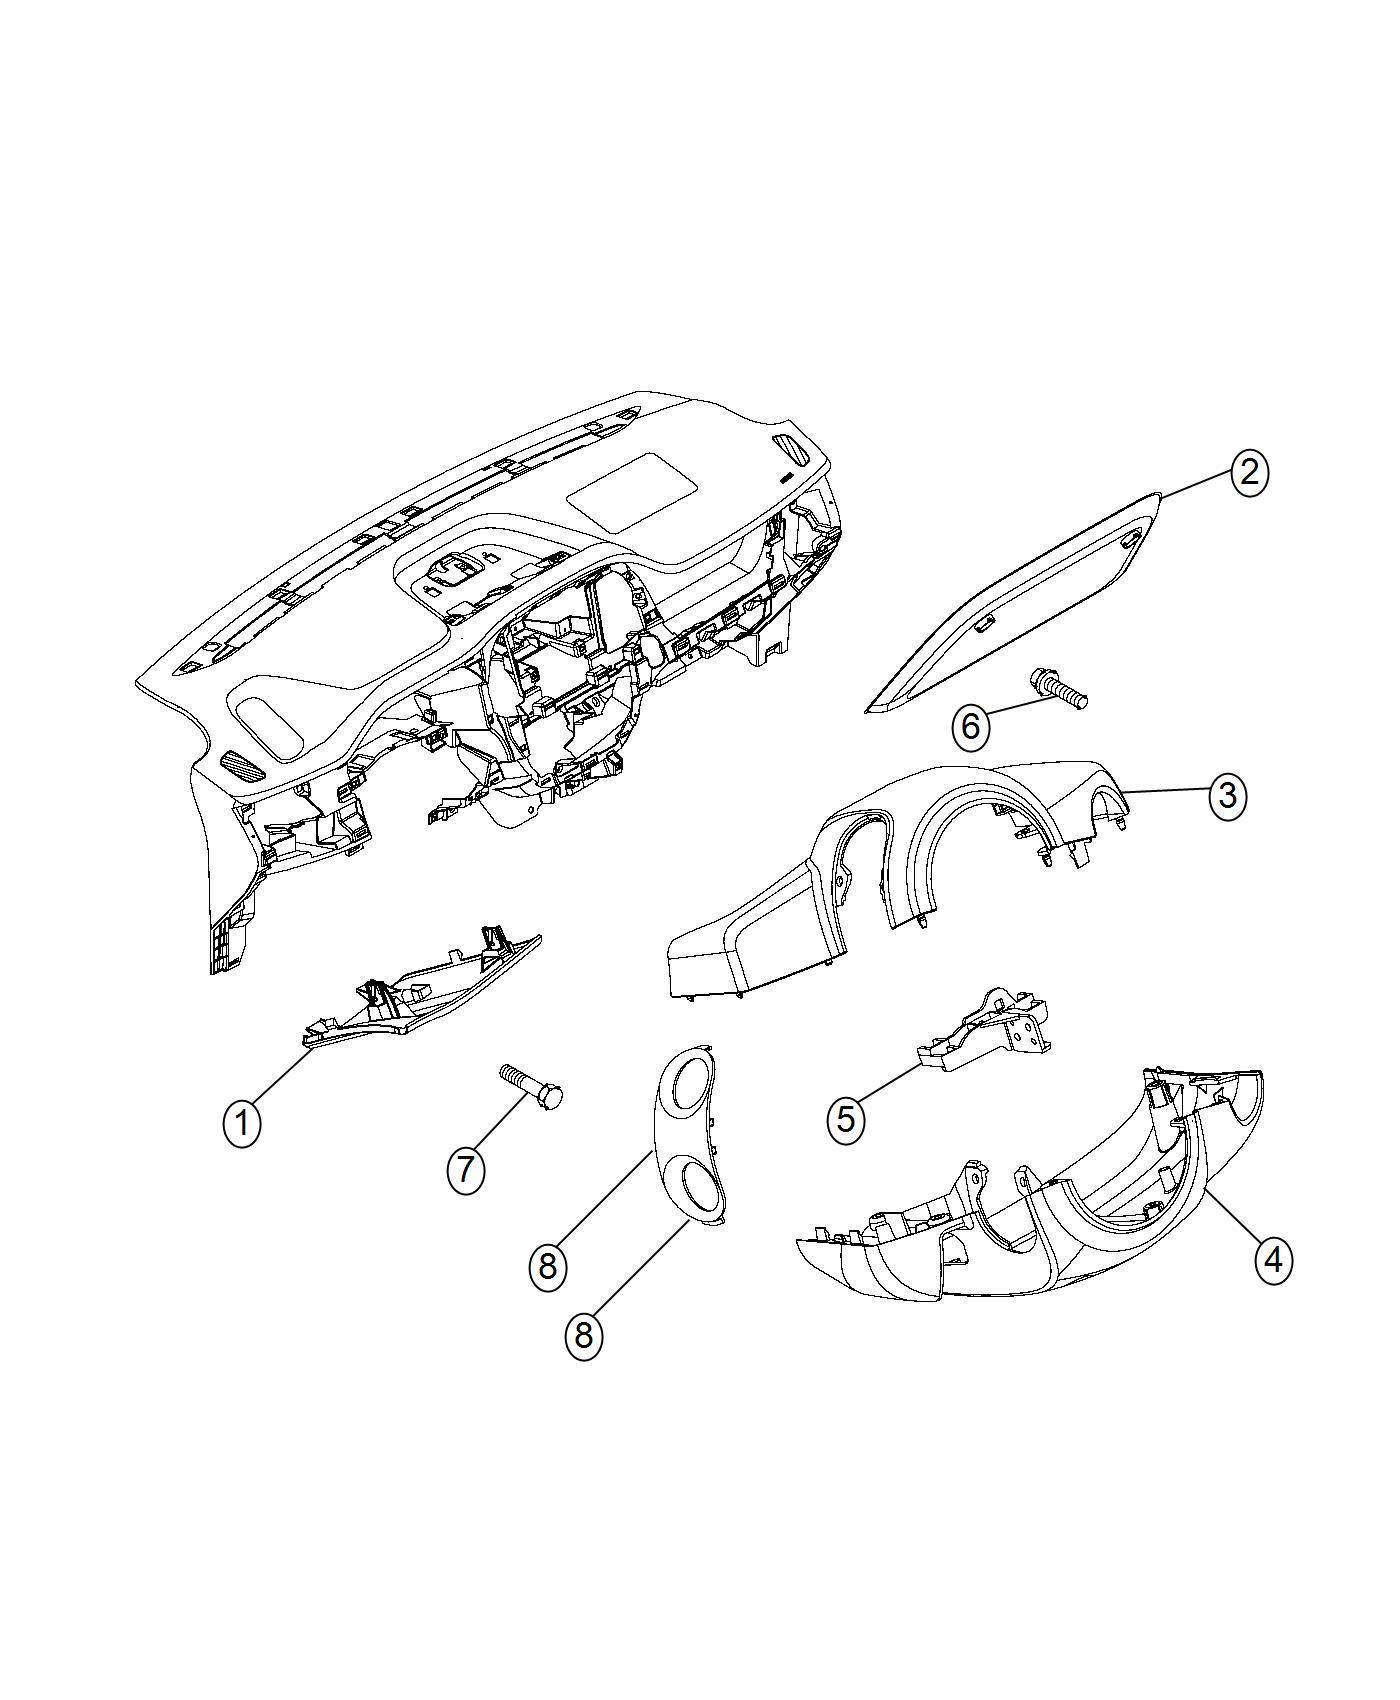 Ram Promaster City Wagon Shroud Steering Column Lower Trim No Description Available